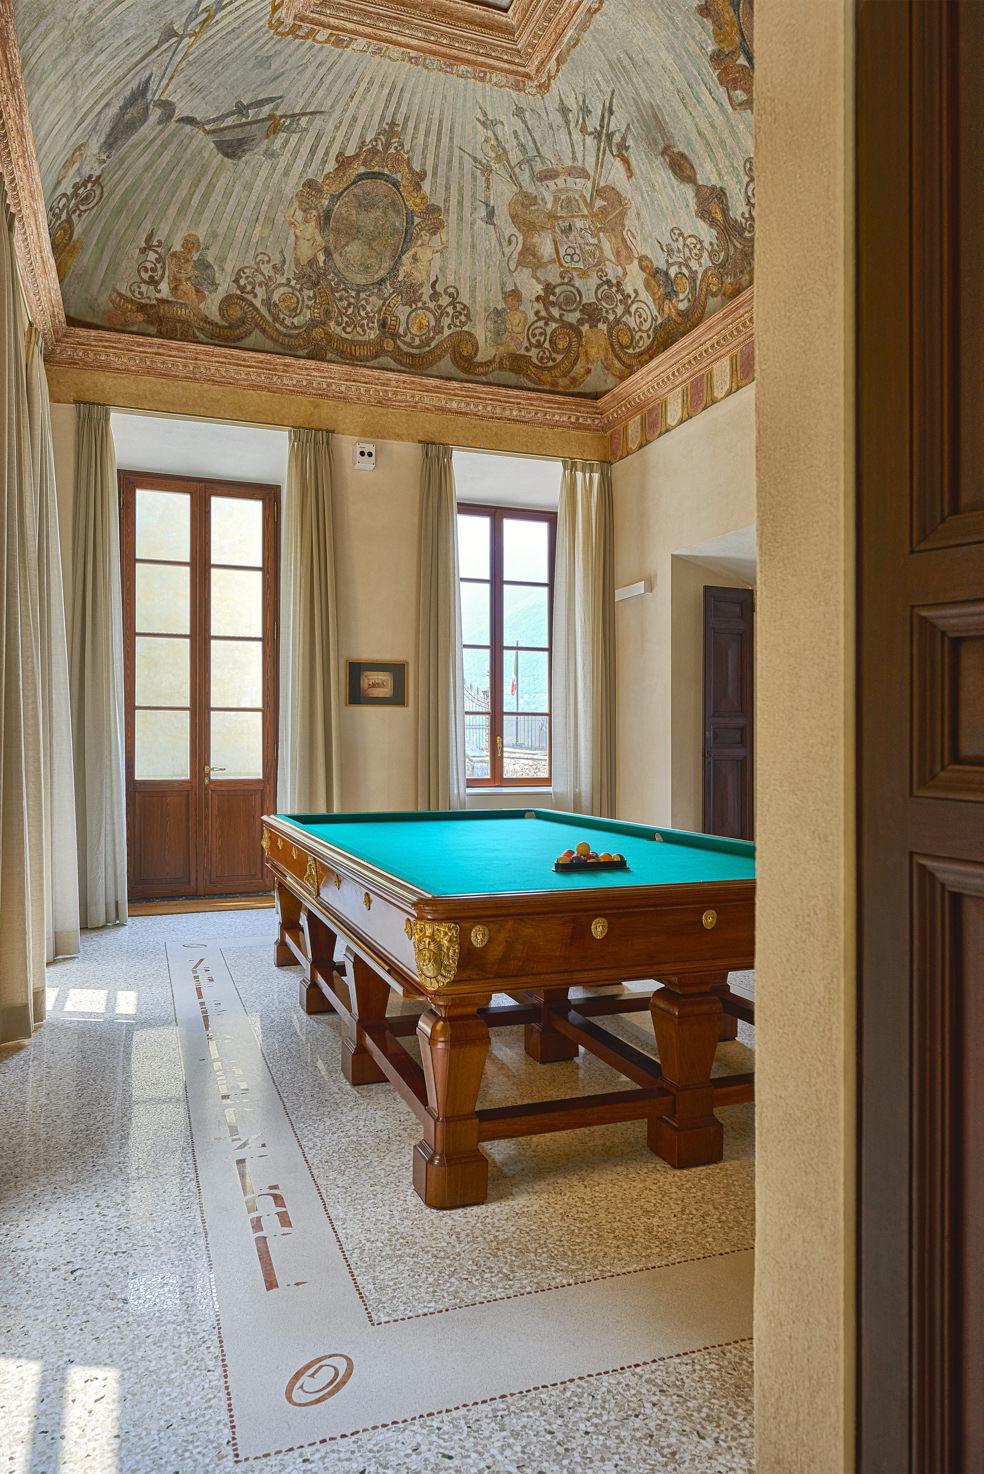 Villa Pliniana interior